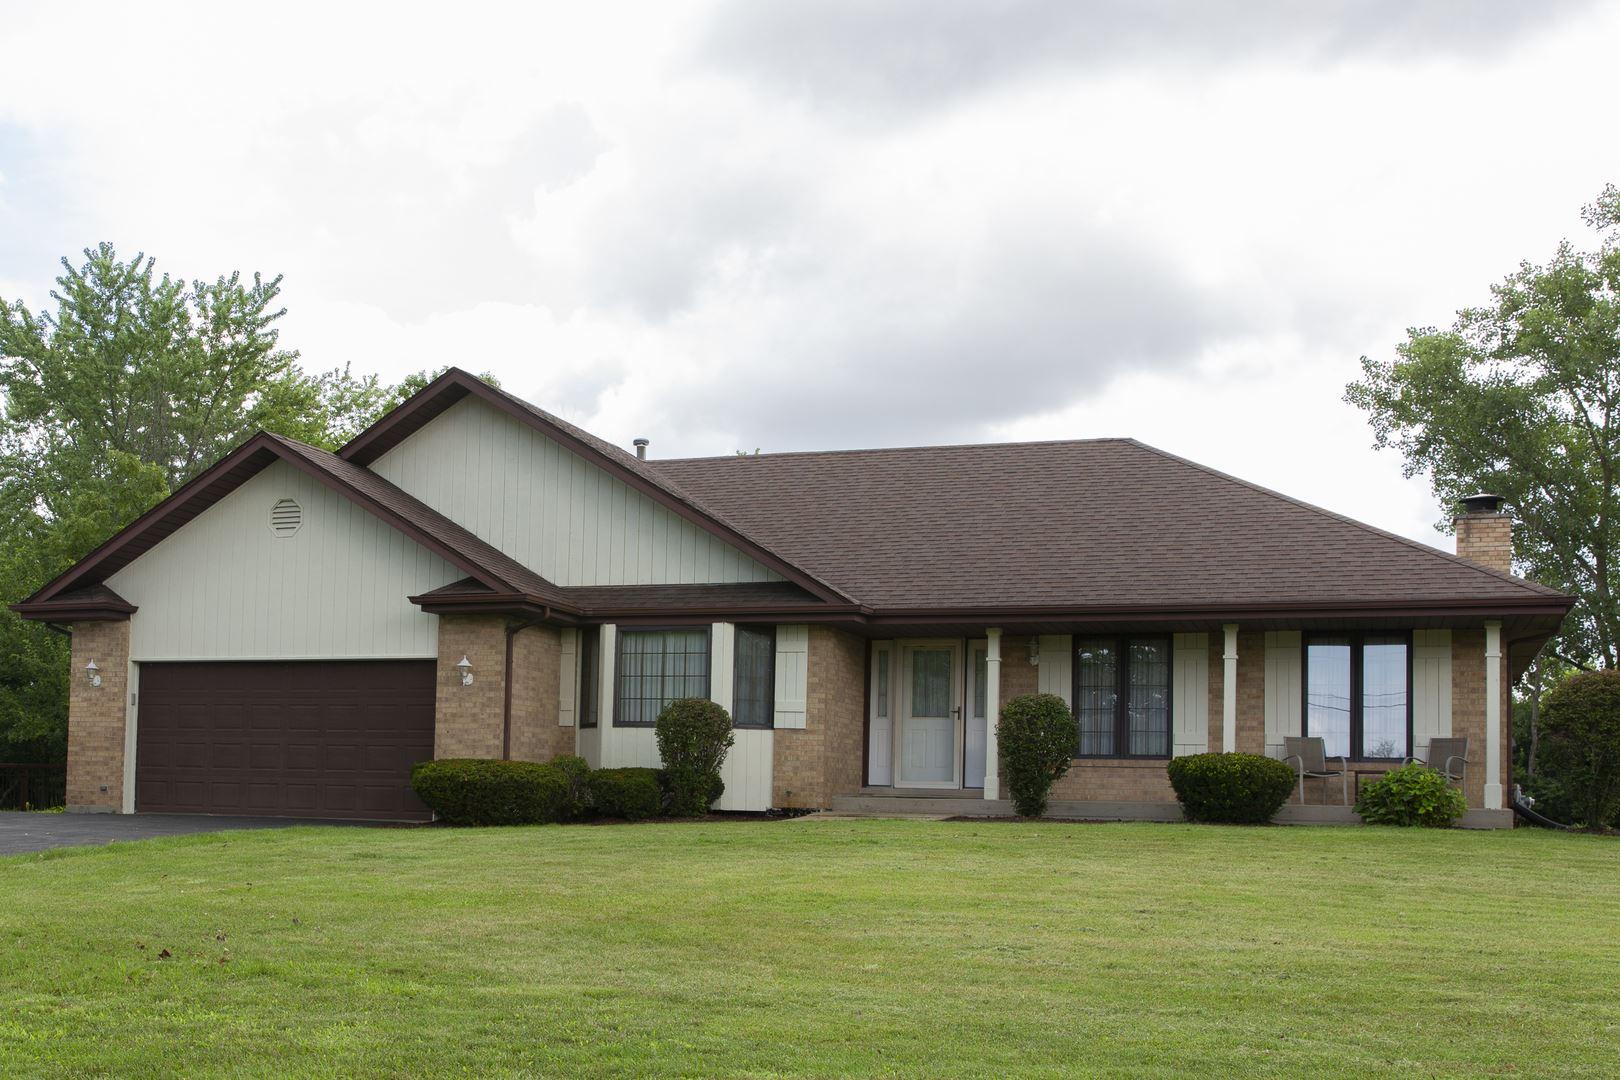 16641 S Parker Road, Homer Glen, IL 60491 - #: 10799926